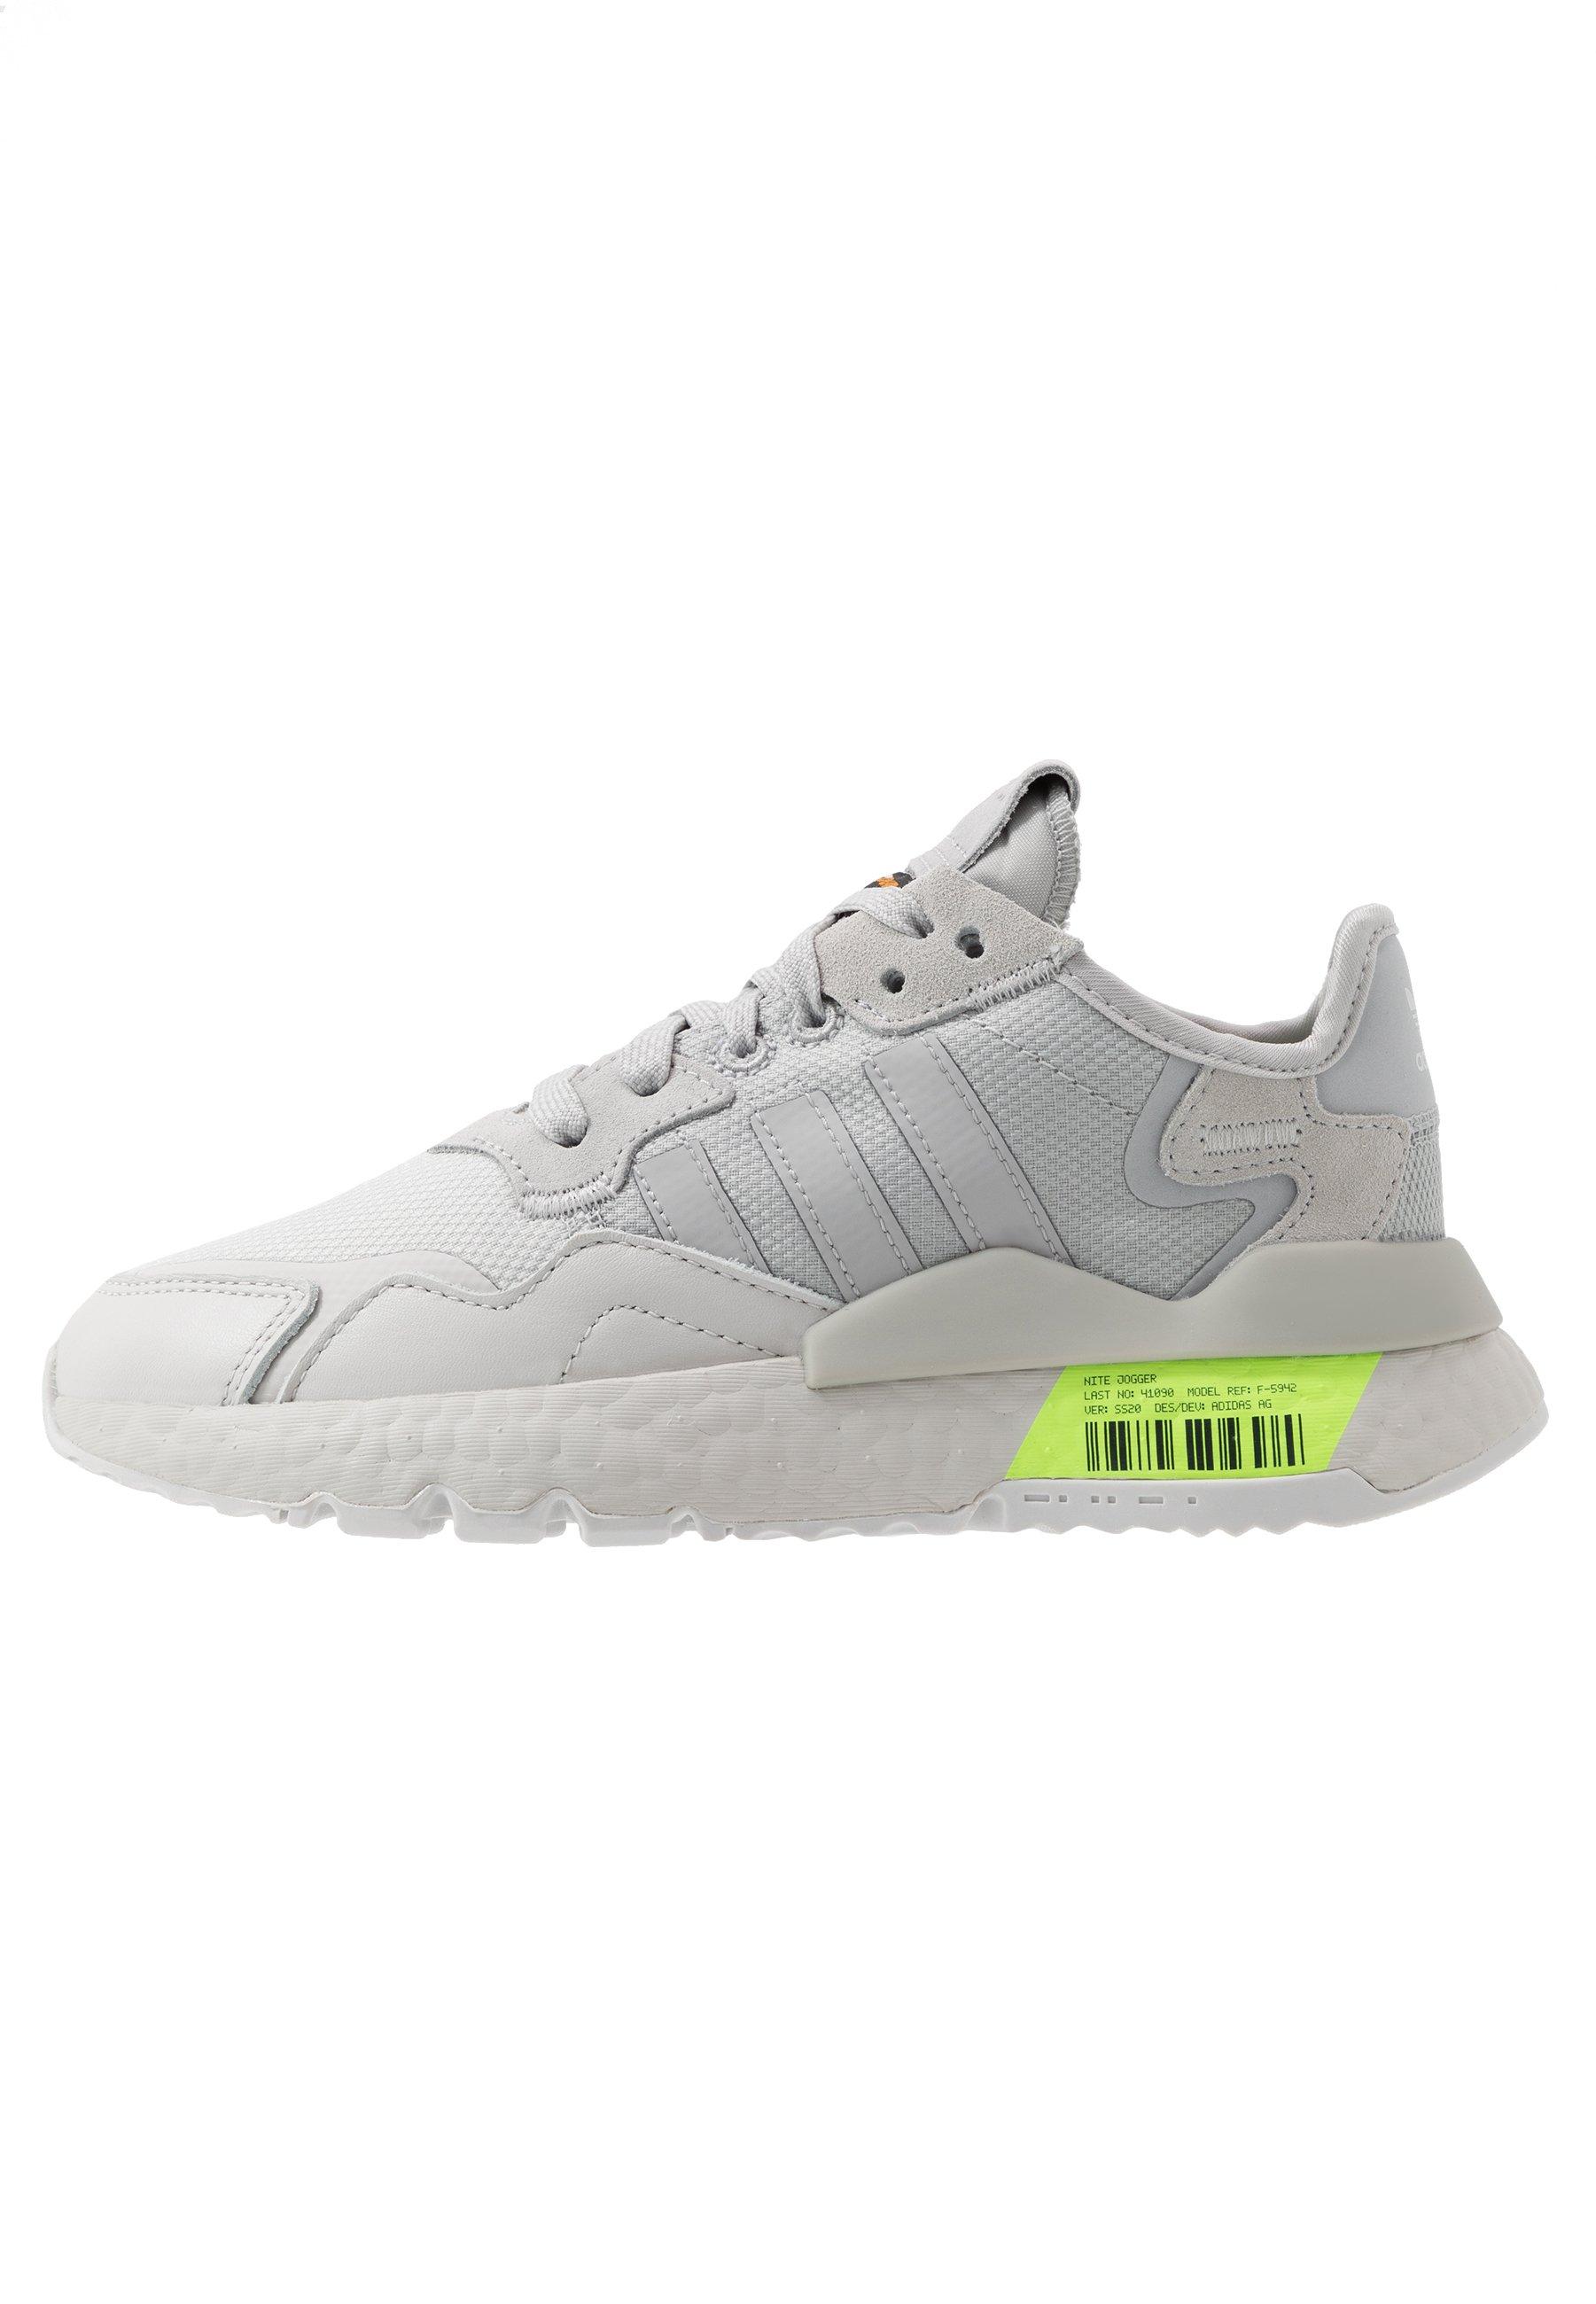 Adidas Nite Jogger | Zalando